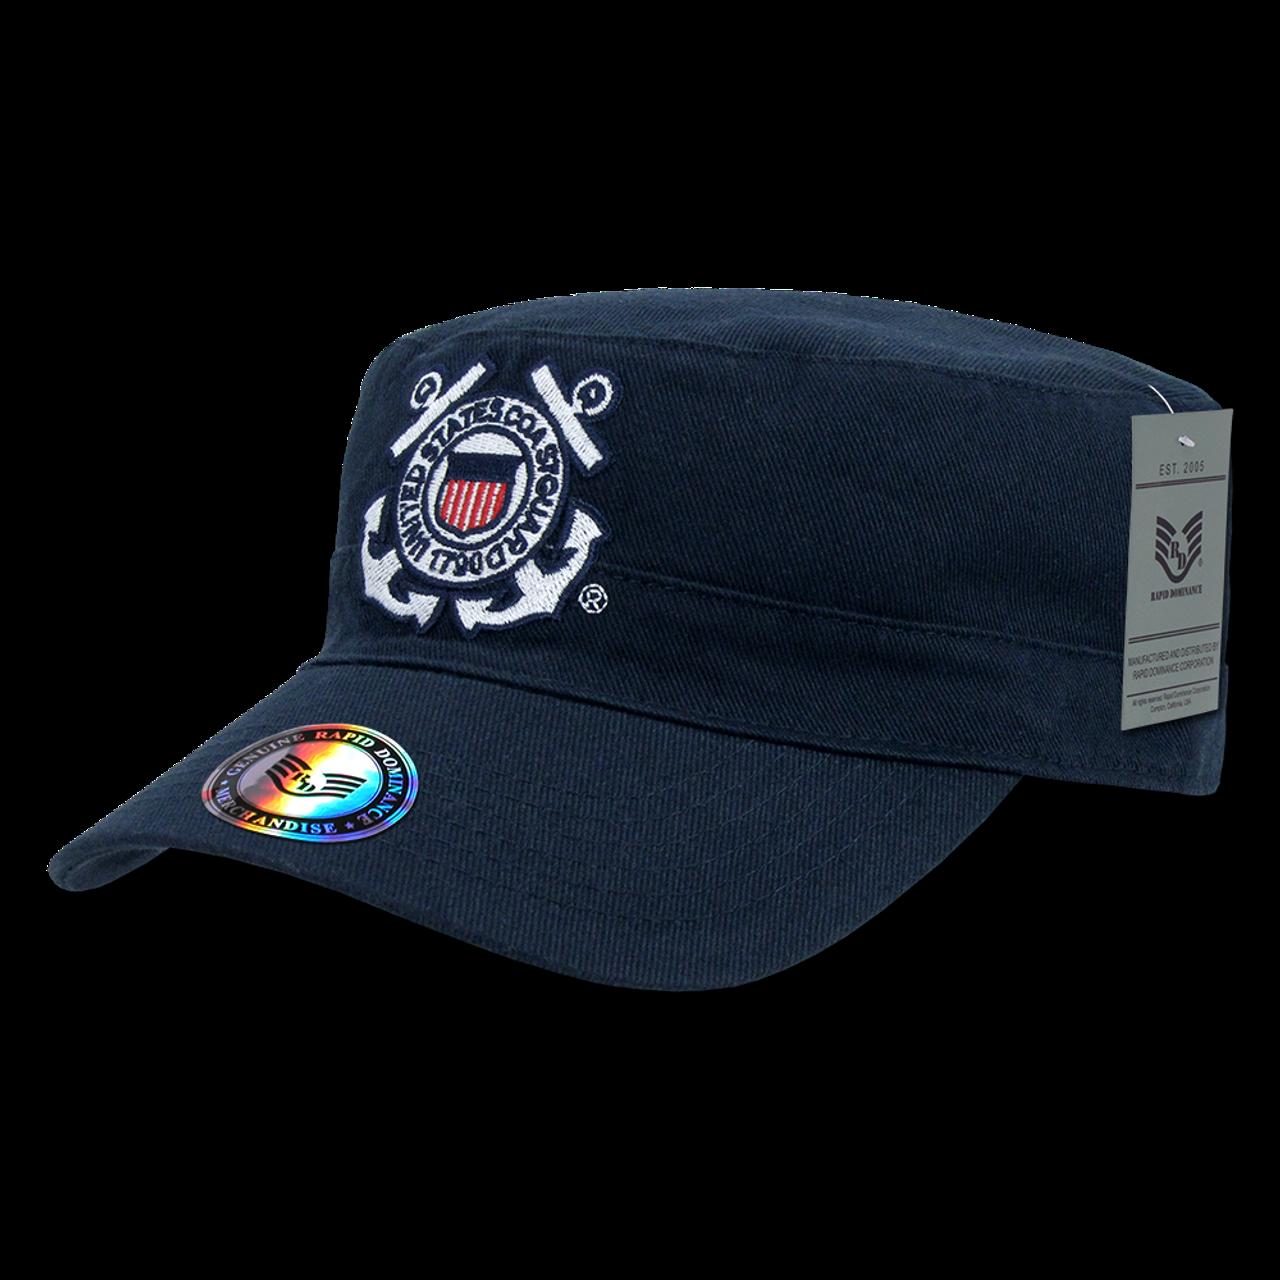 S009 - Coast Guard Patrol Cap - Vintage Military Style - Reversible - Dark  Blue